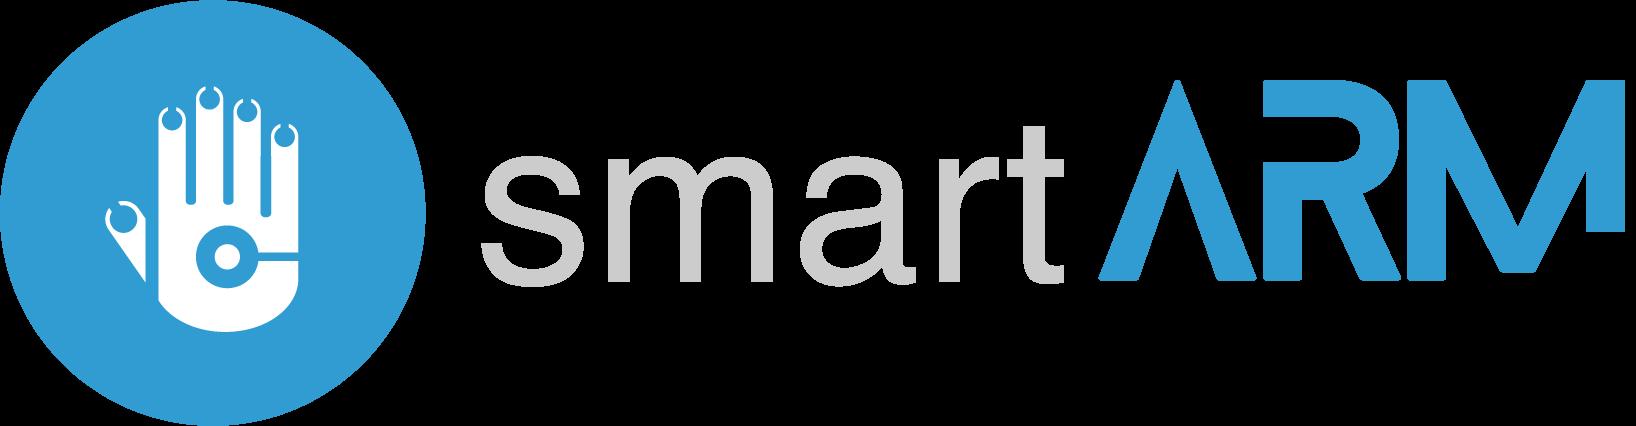 smartARM logo.png